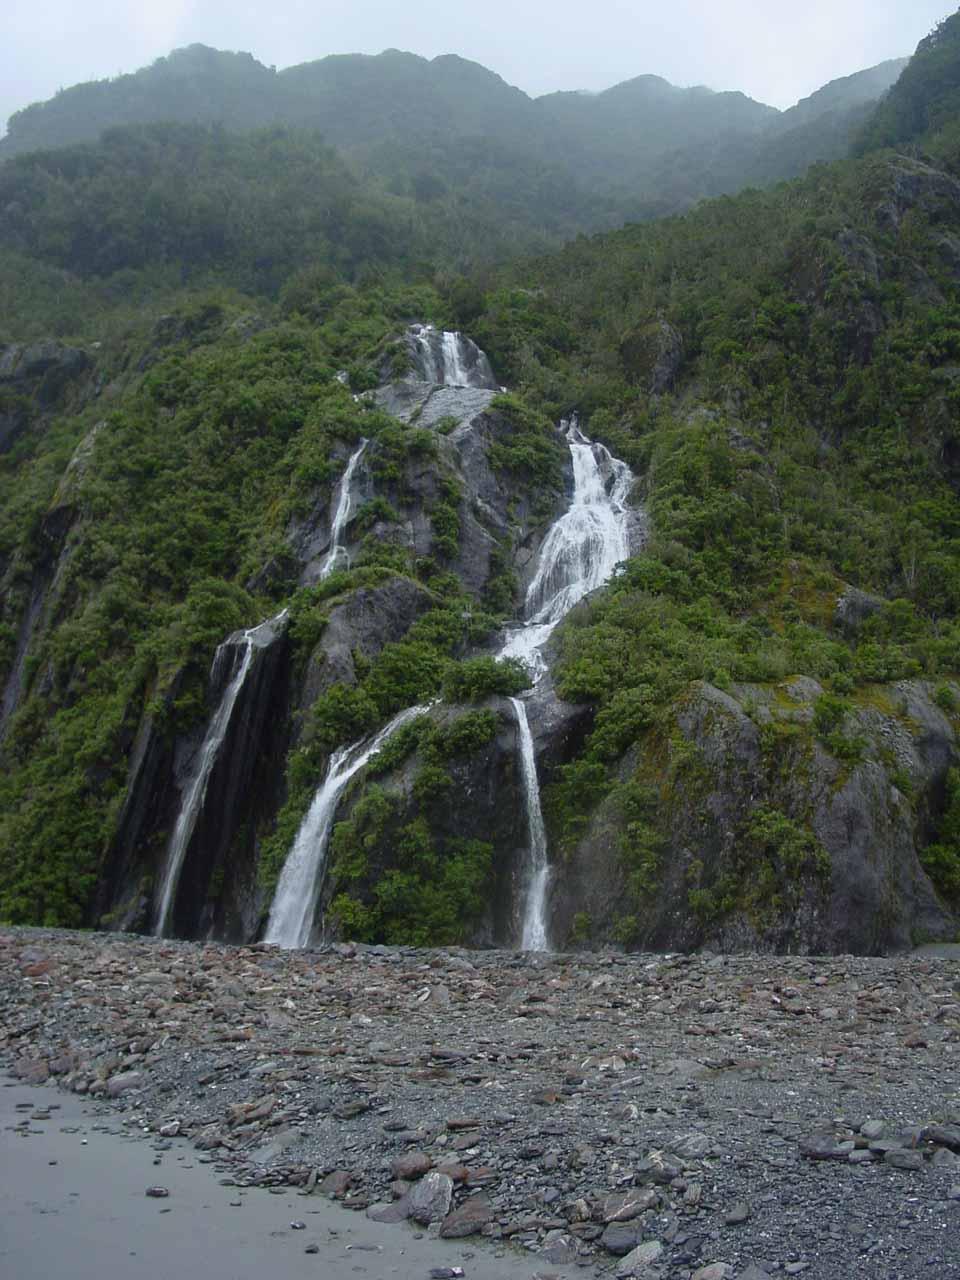 Looking at Trident Creek Falls